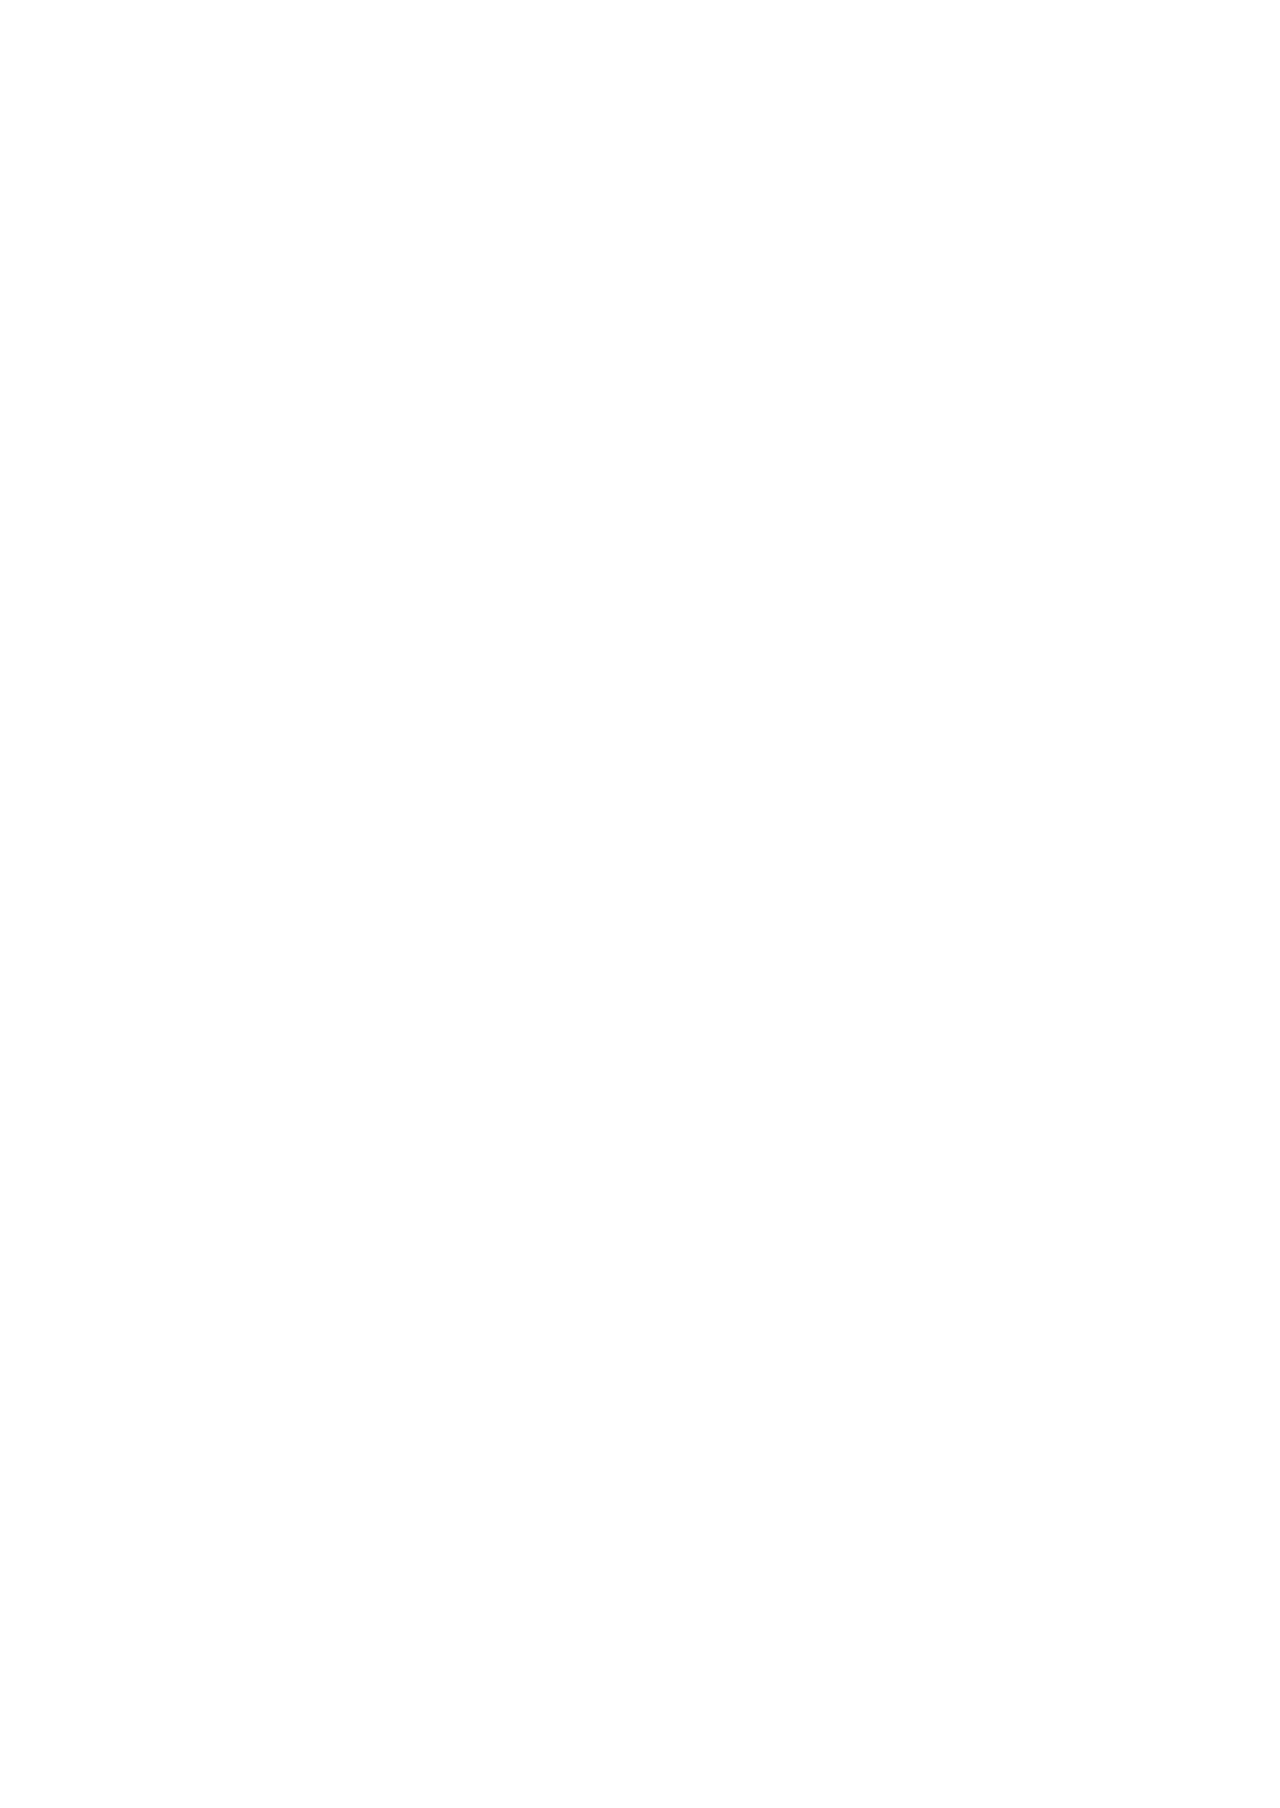 [Akuten Soushin (Kokutou Nikke)] Kanmusu Chakunin Zenya - Atlanta Mune-Sei Houshi Katsudou (Kantai Collection -KanColle-) [Chinese] [therethere個人翻譯&嵌字] [Digital] 31